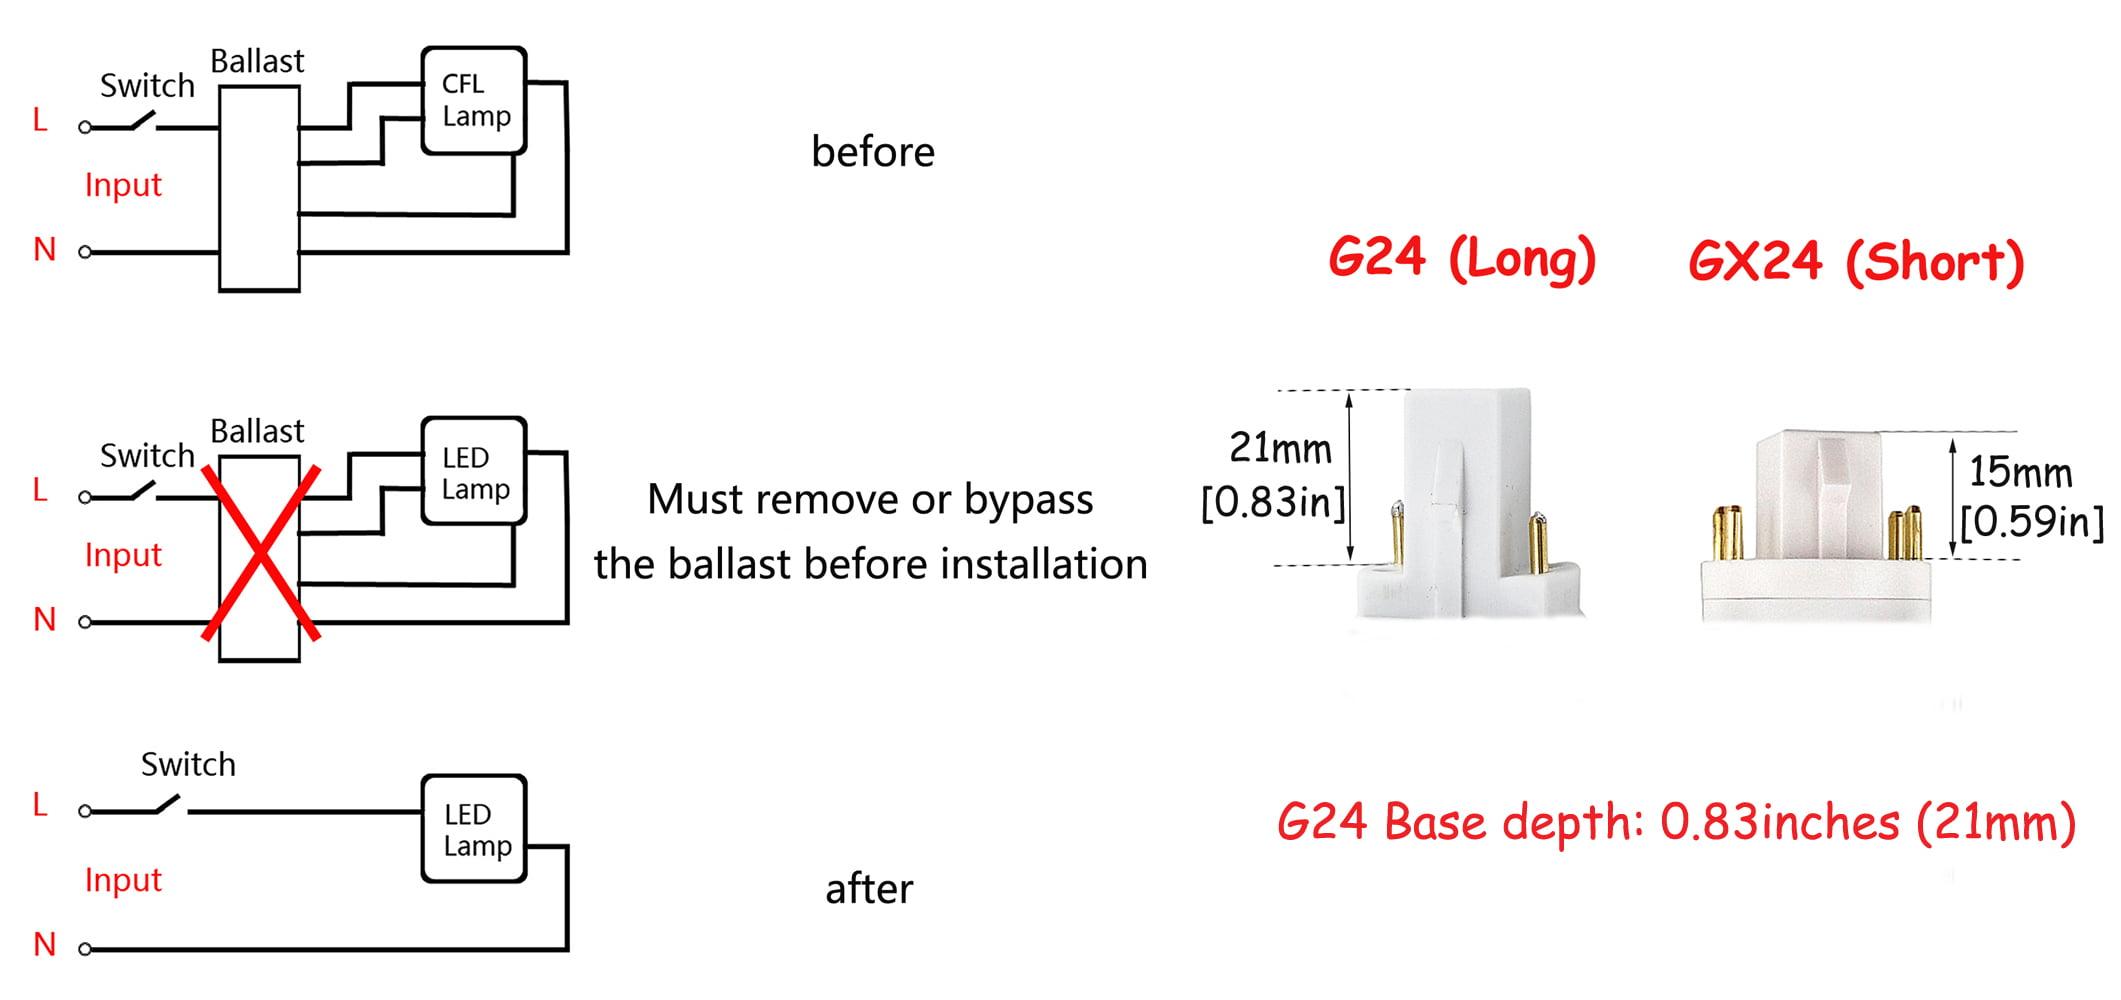 bonlux 13w g24 led pl retrofit lamp universal g24d 2 pin g24q 4 pin rh walmart com Schematic Circuit Diagram Schematic Circuit Diagram